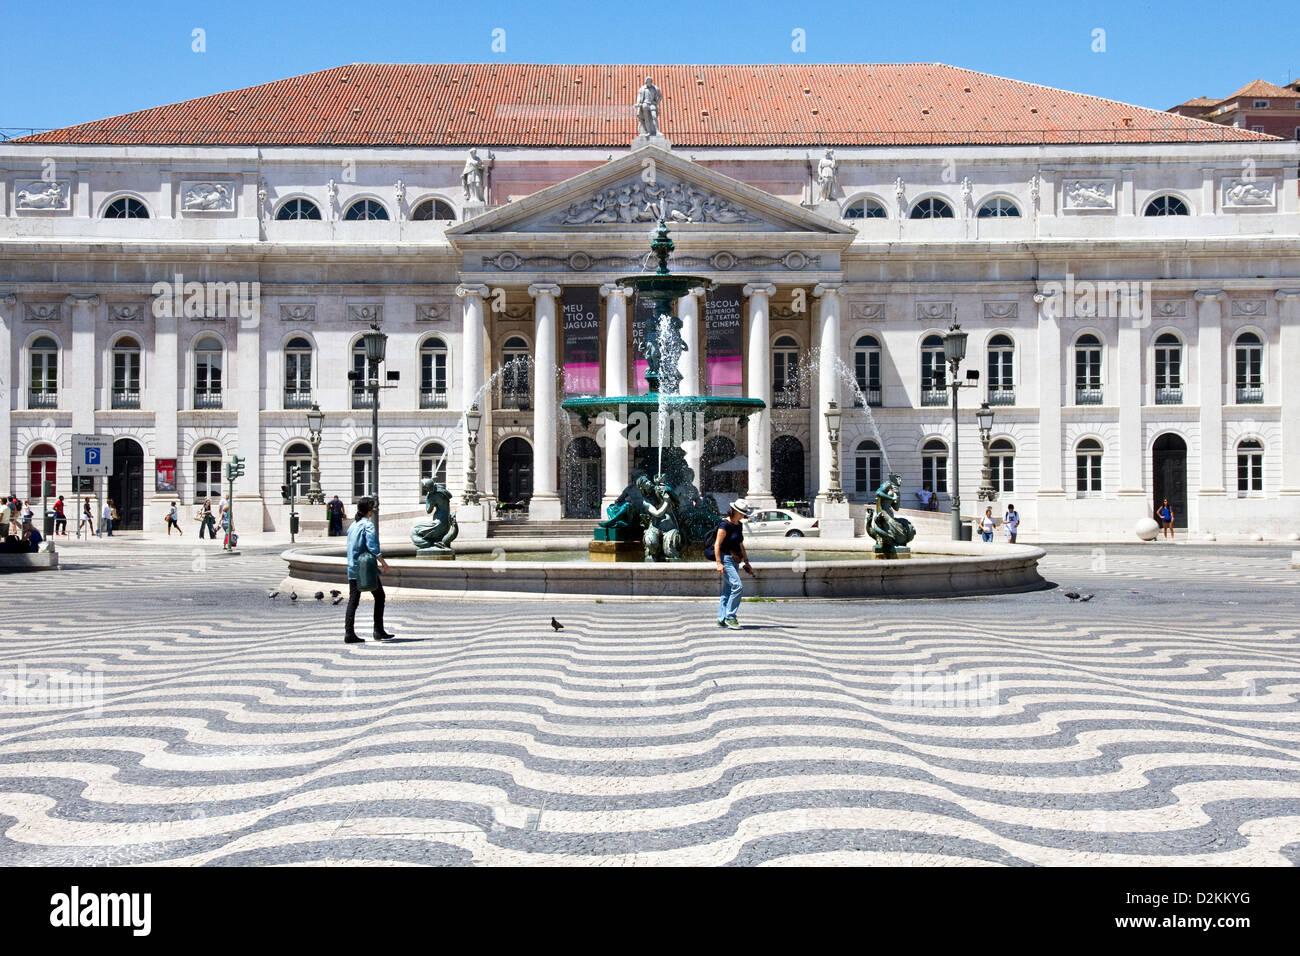 Rossio Square(also known as Pedro IV Square ( Praça de D. Pedro IV)) and National Theatre, central Lisbon, Portugal. Stock Photo